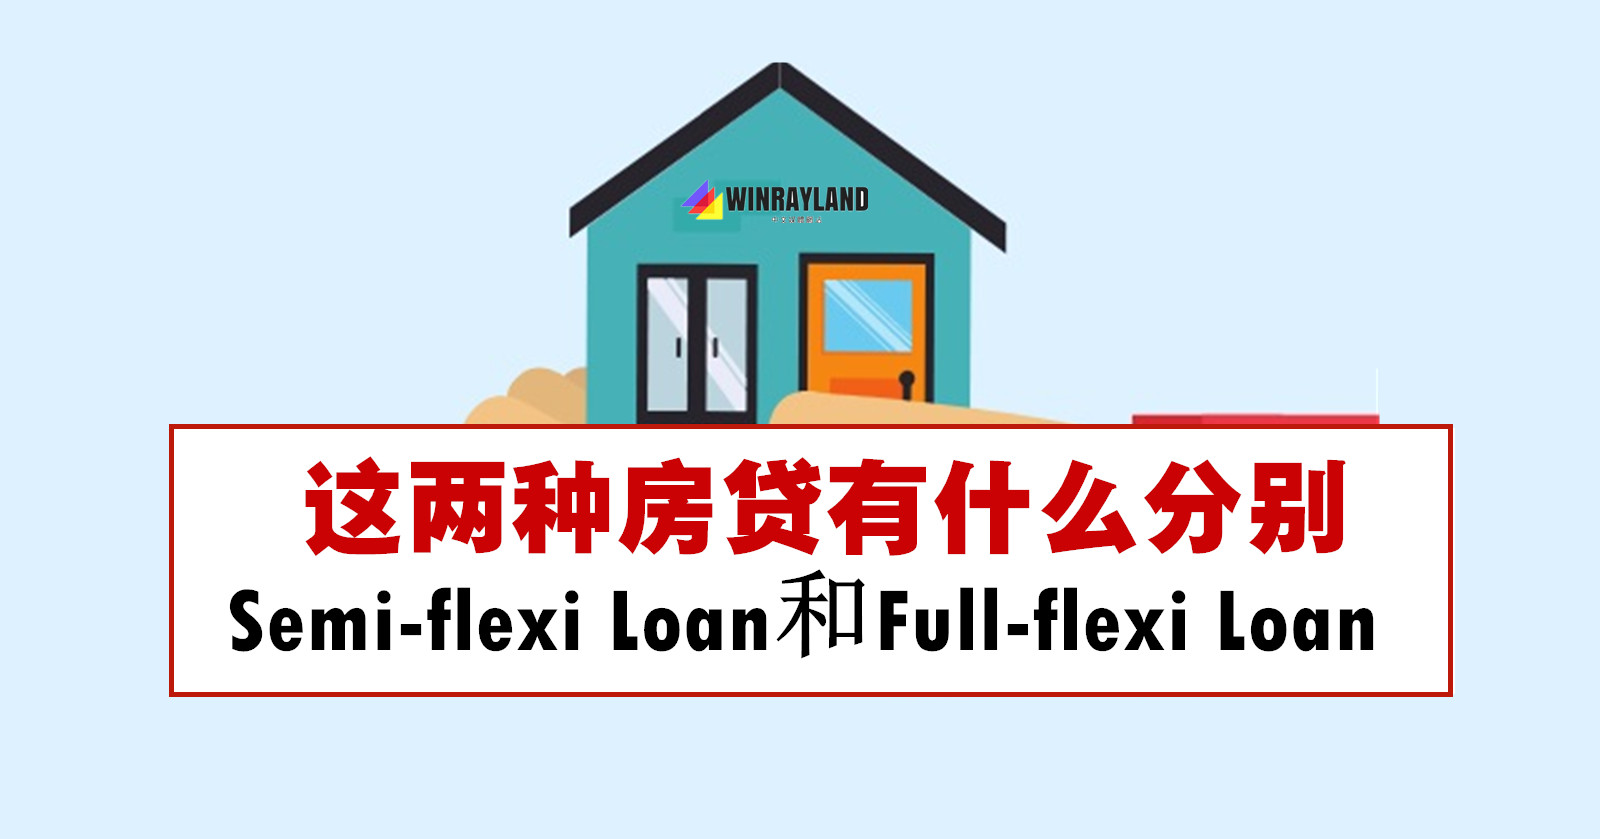 Semi-flexi Loan和Full-flexi Loan有什么分别,一起来看看